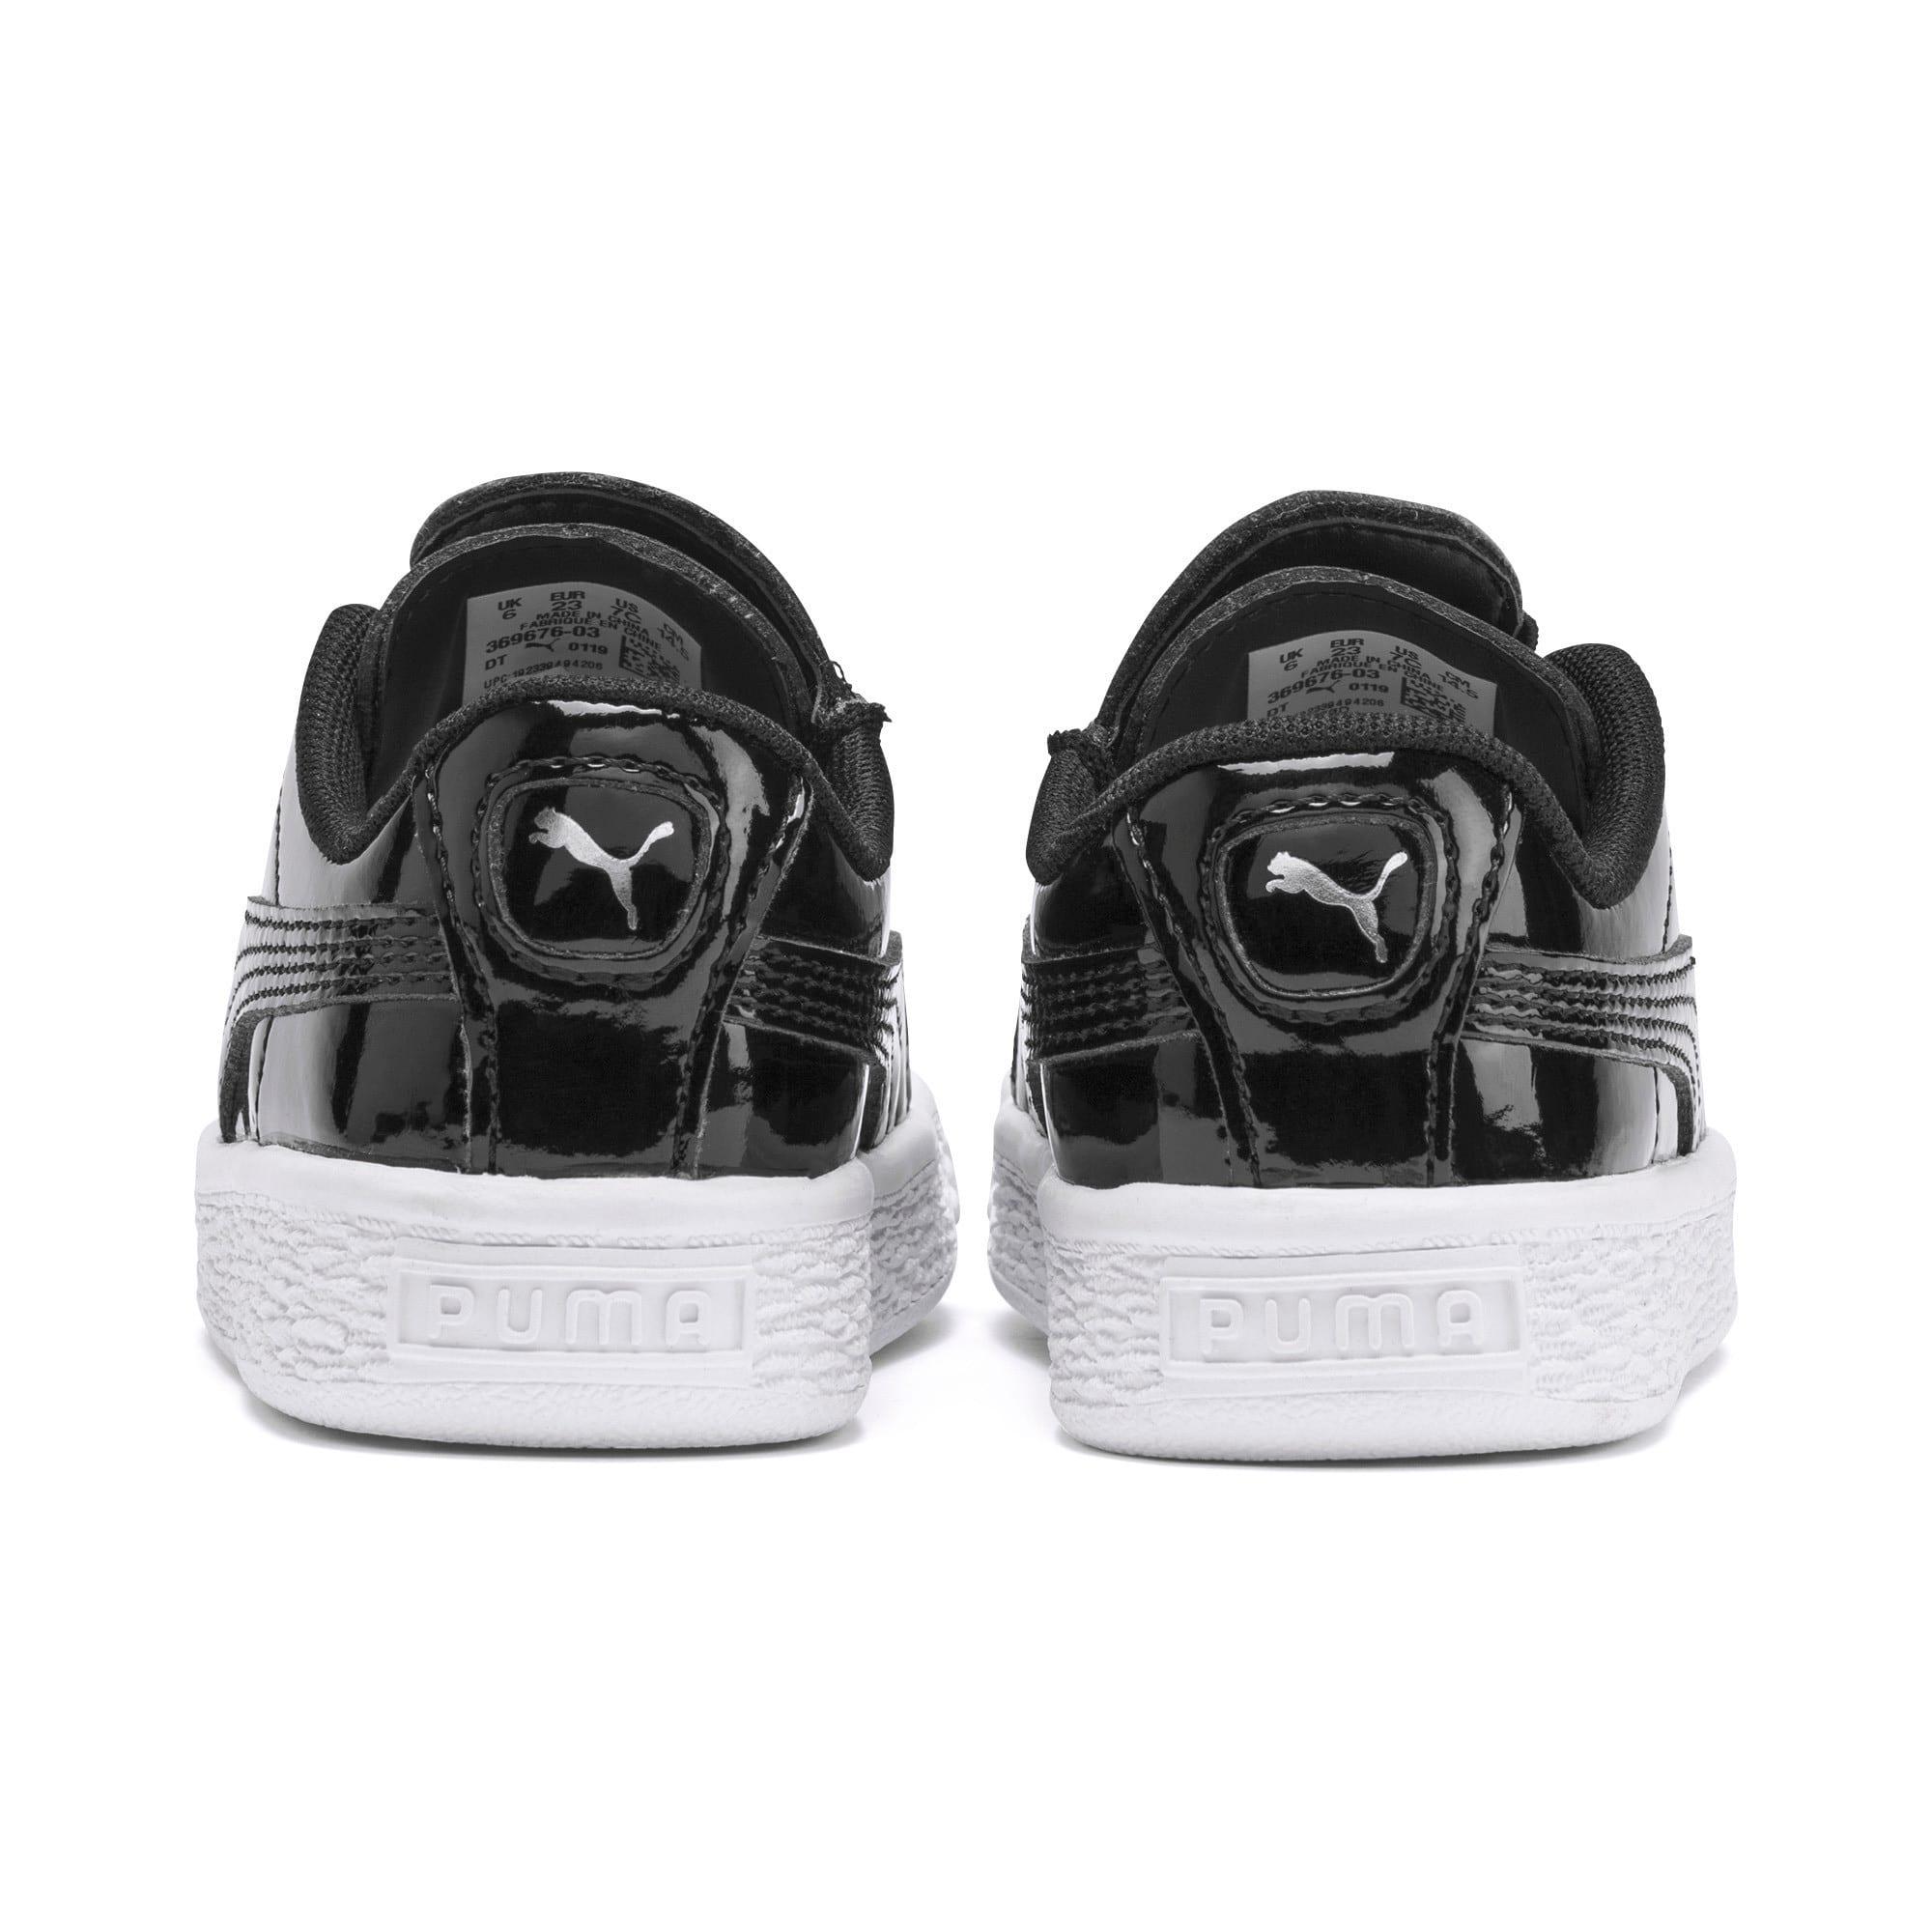 Thumbnail 3 of Basket Crush Patent AC Toddler Shoes, Puma Black-Puma White, medium